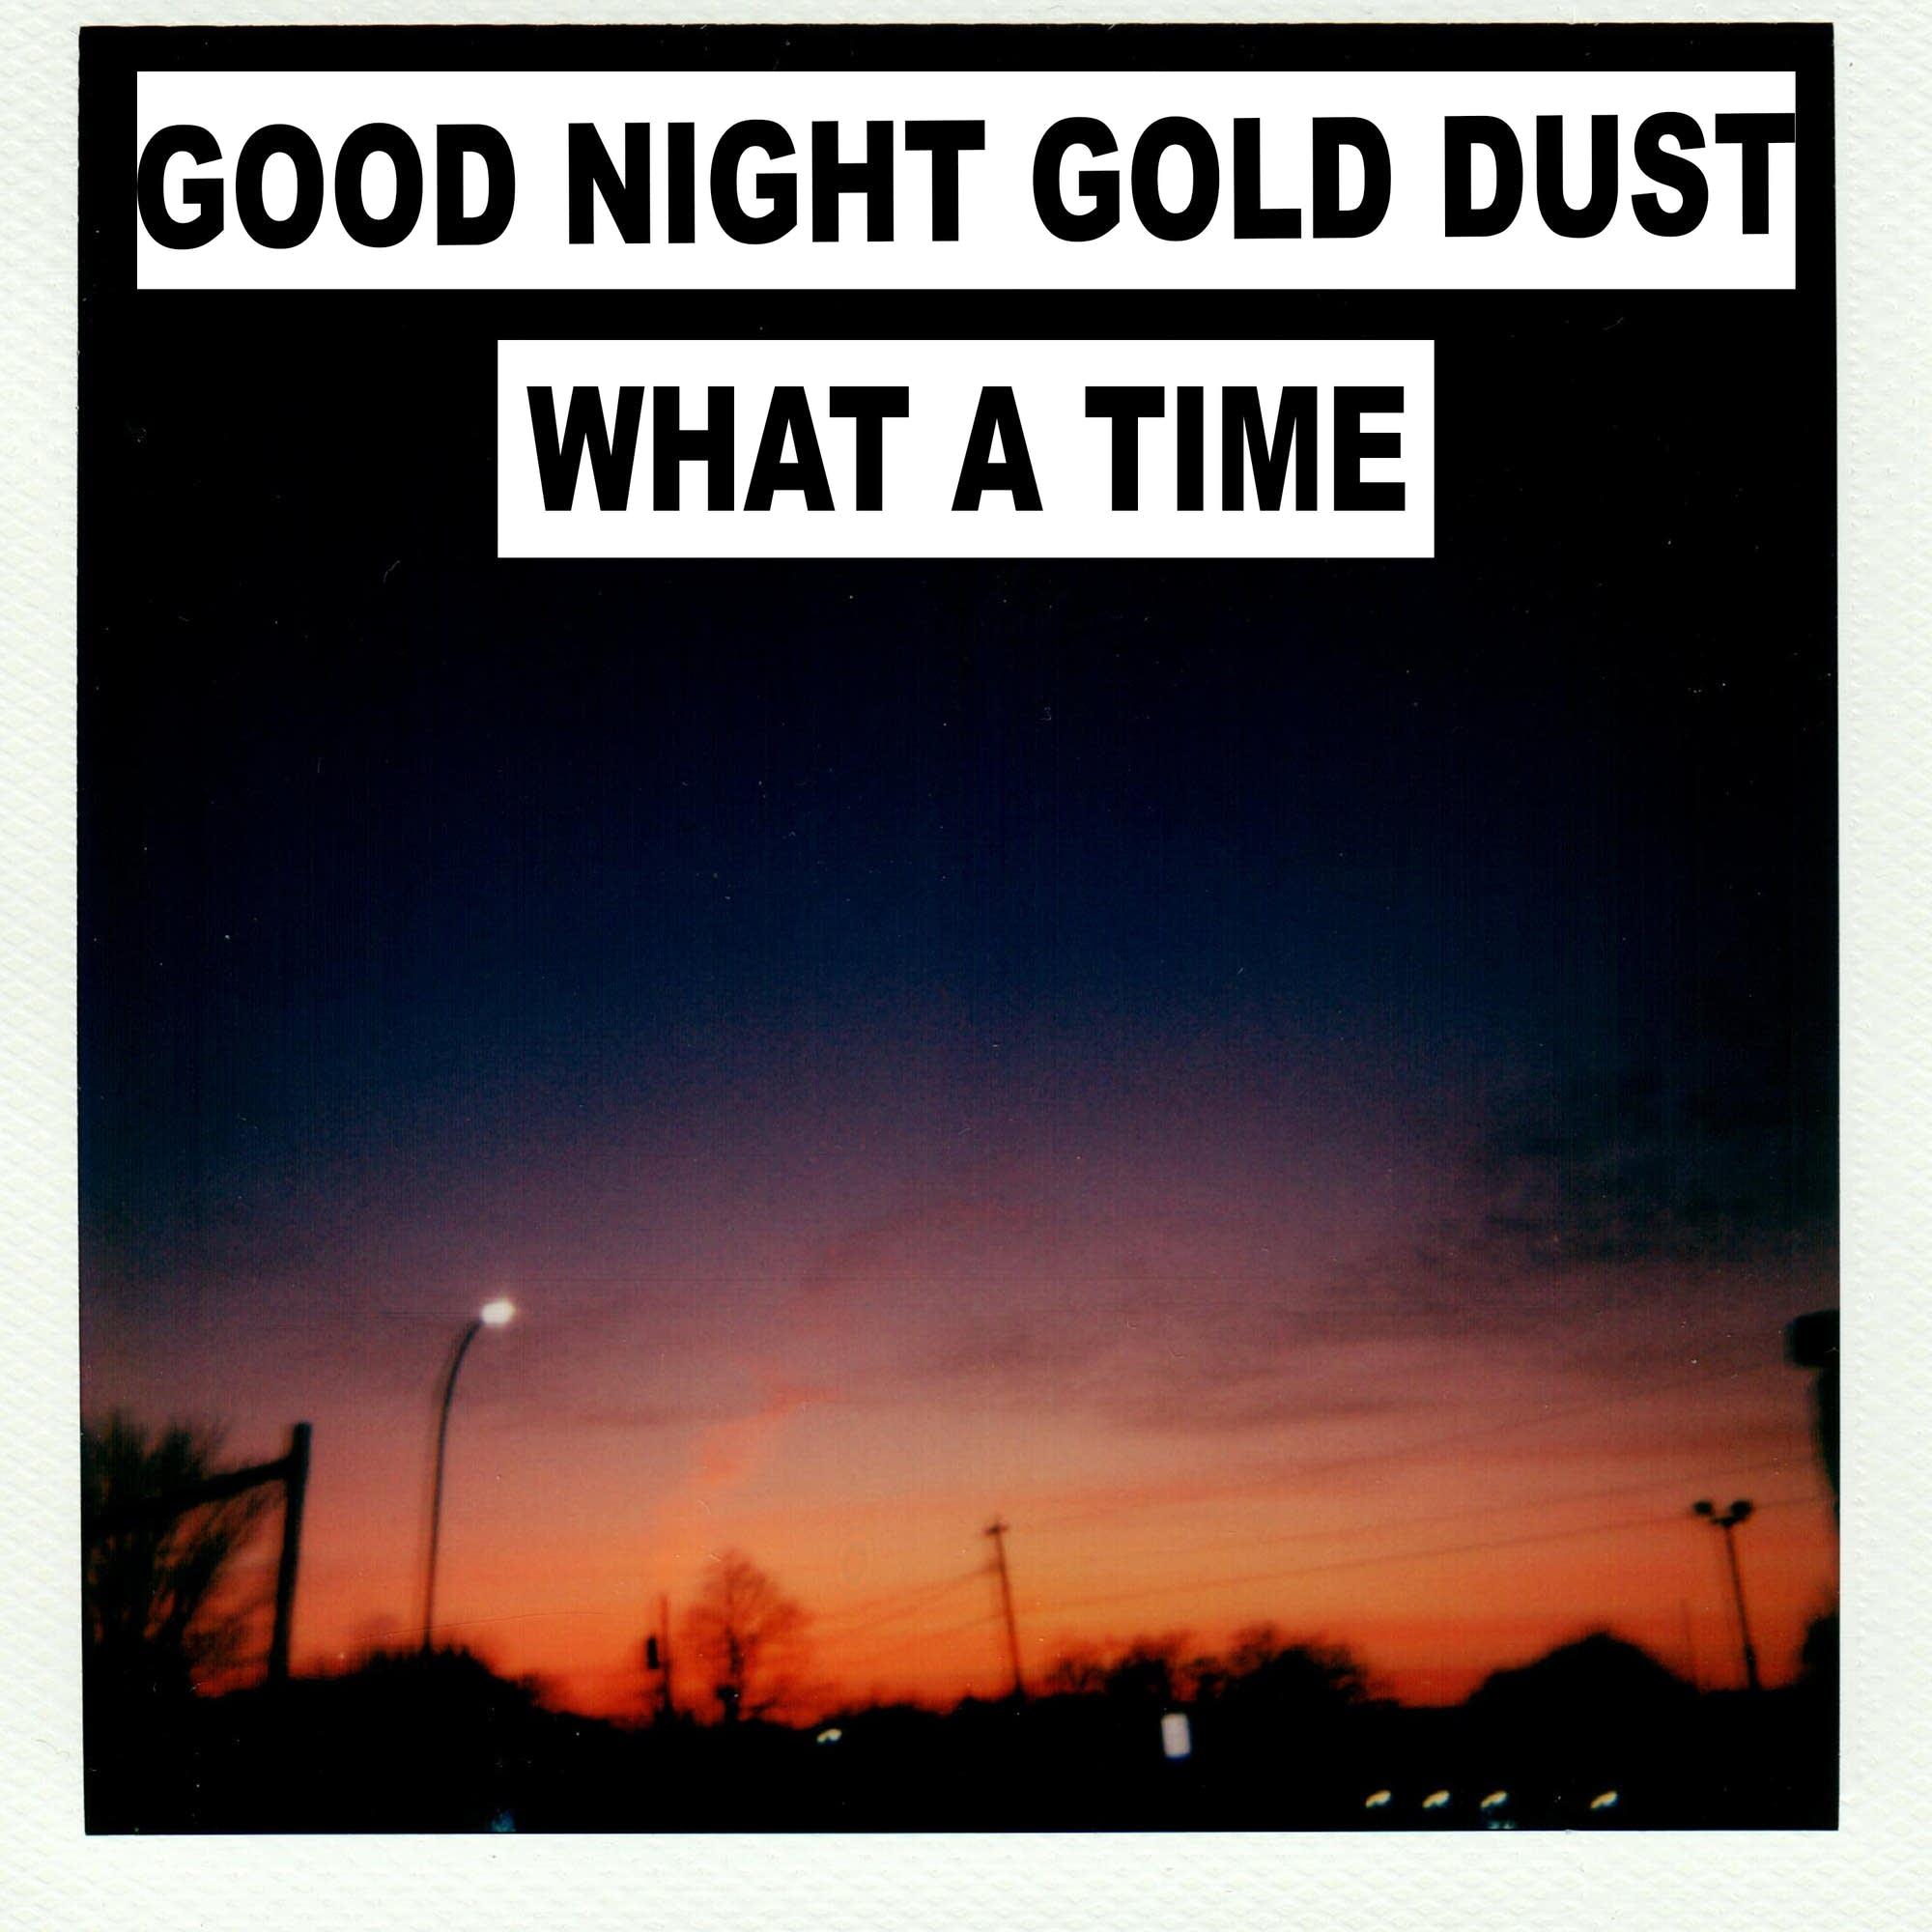 Good Night Gold Dust